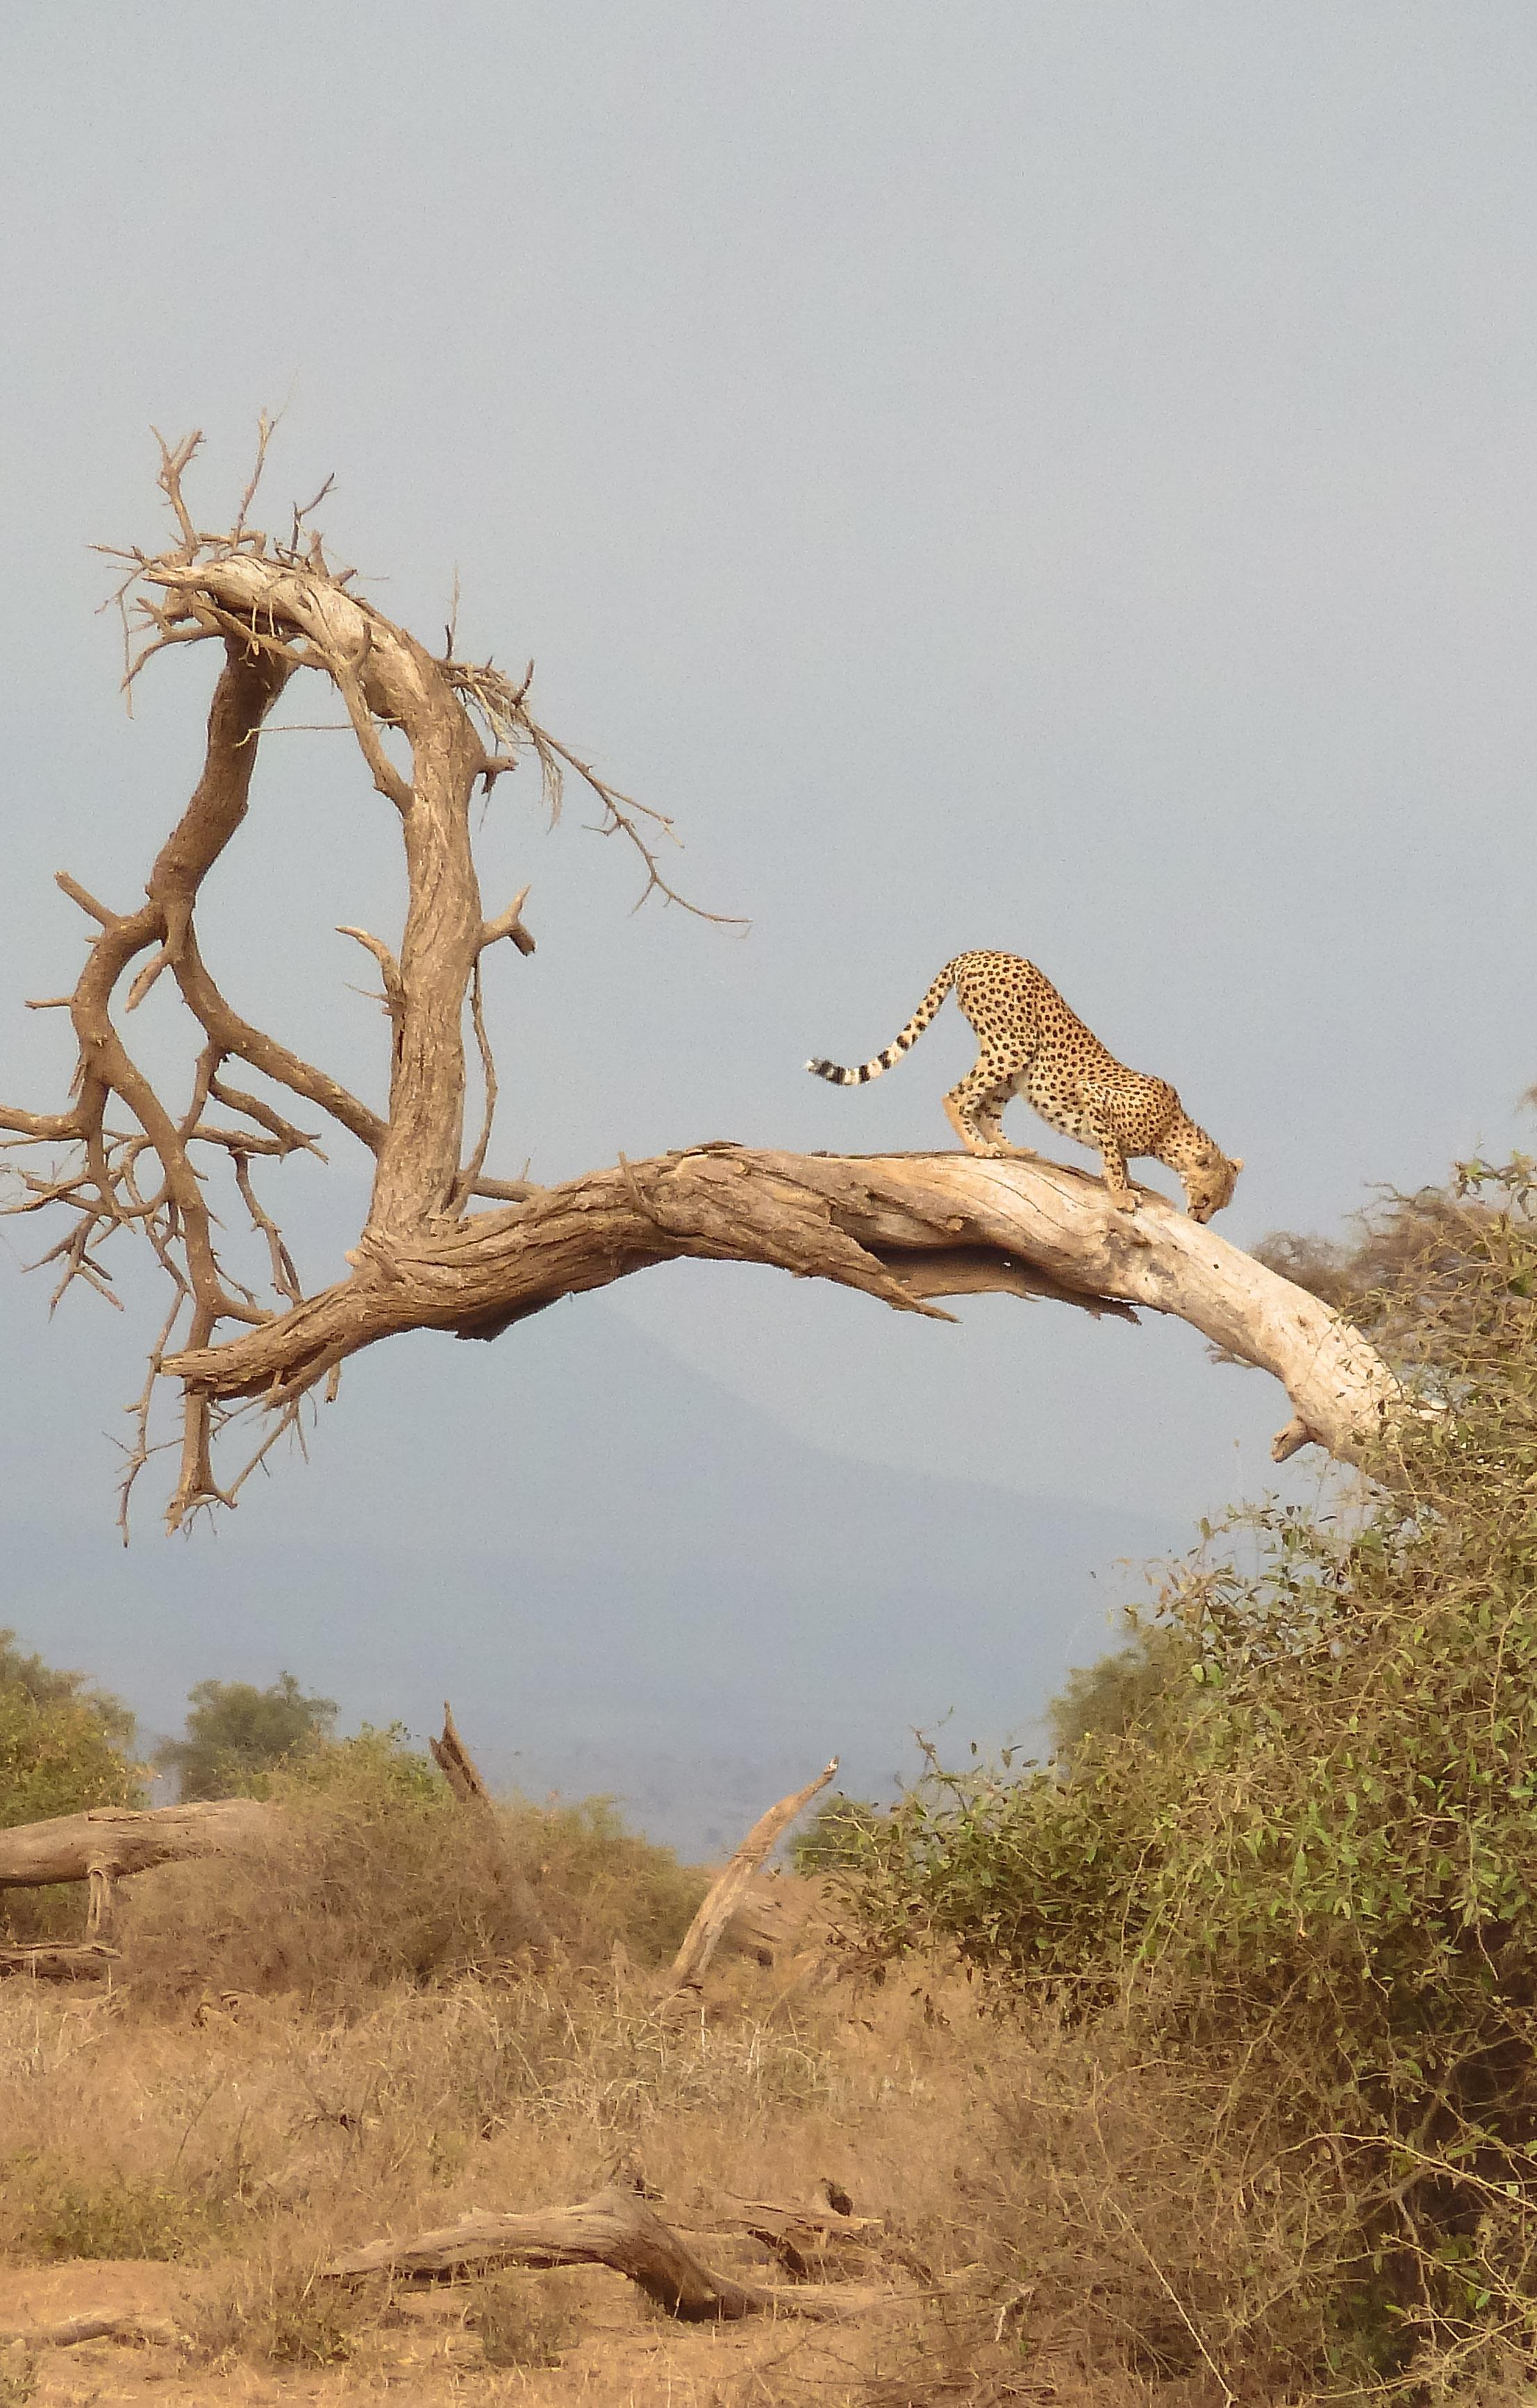 curio.trips.kenya.cheetah.bent.forward.tree.portrait.jpg